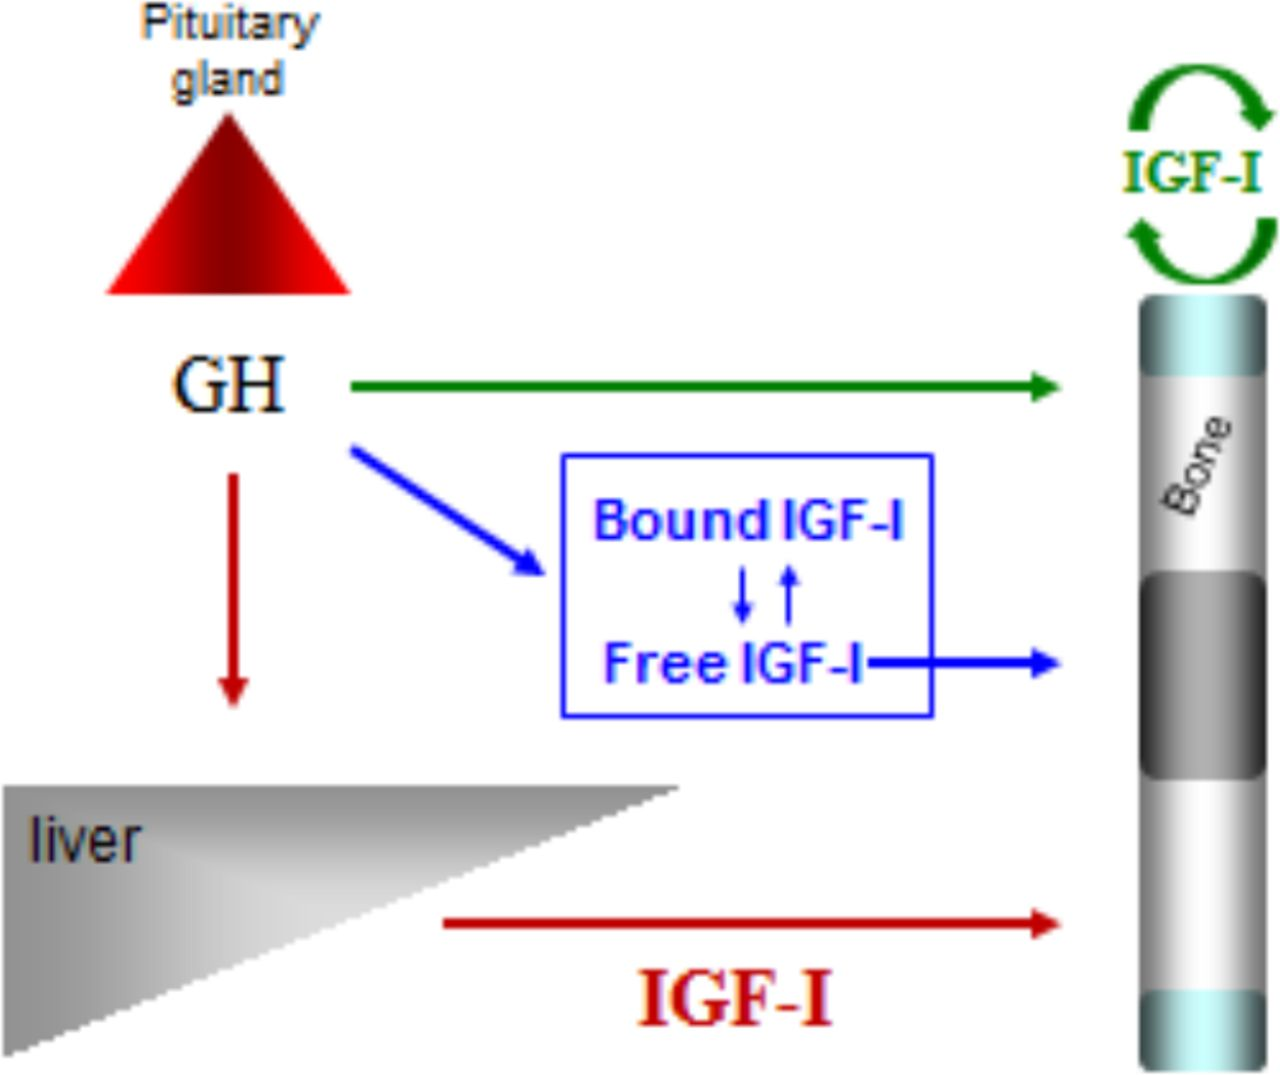 How To Interpret IGF-1 And Growth Hormone Stimulation